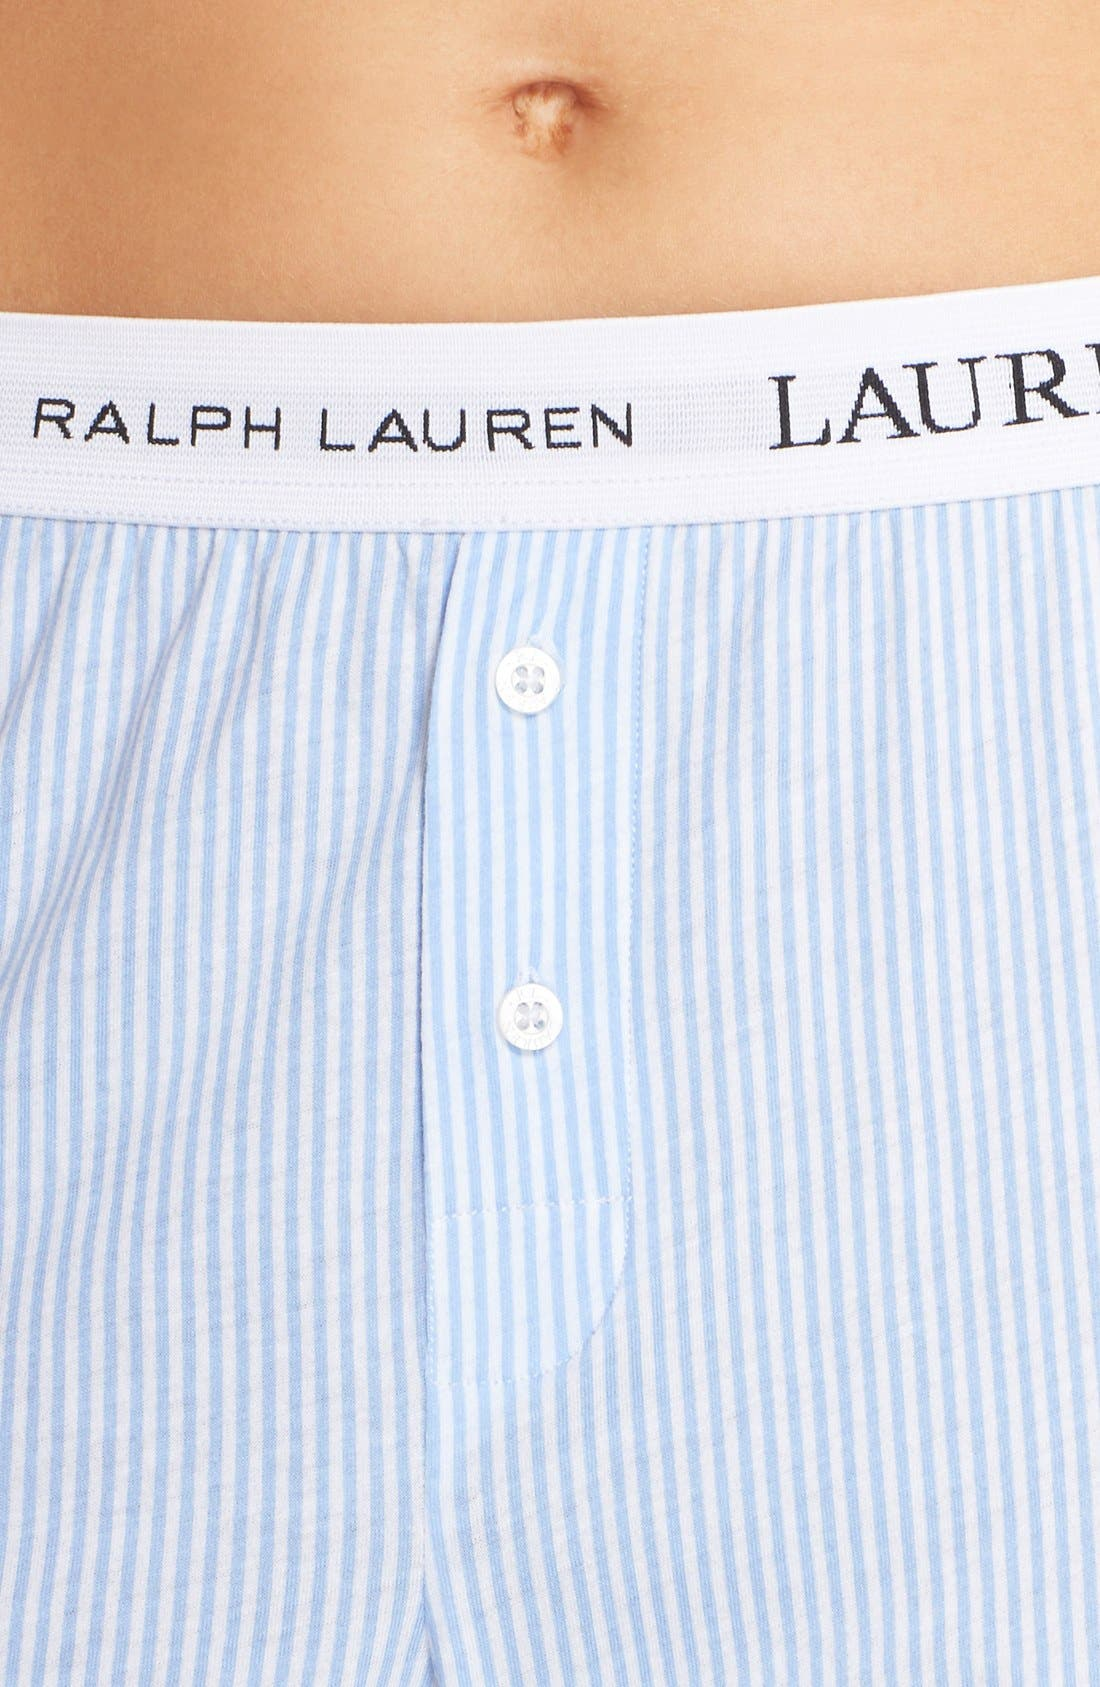 LAUREN RALPH LAUREN, Logo Waistband Lounge Pants, Alternate thumbnail 2, color, STRIPE PALE BLUE/ WHITE